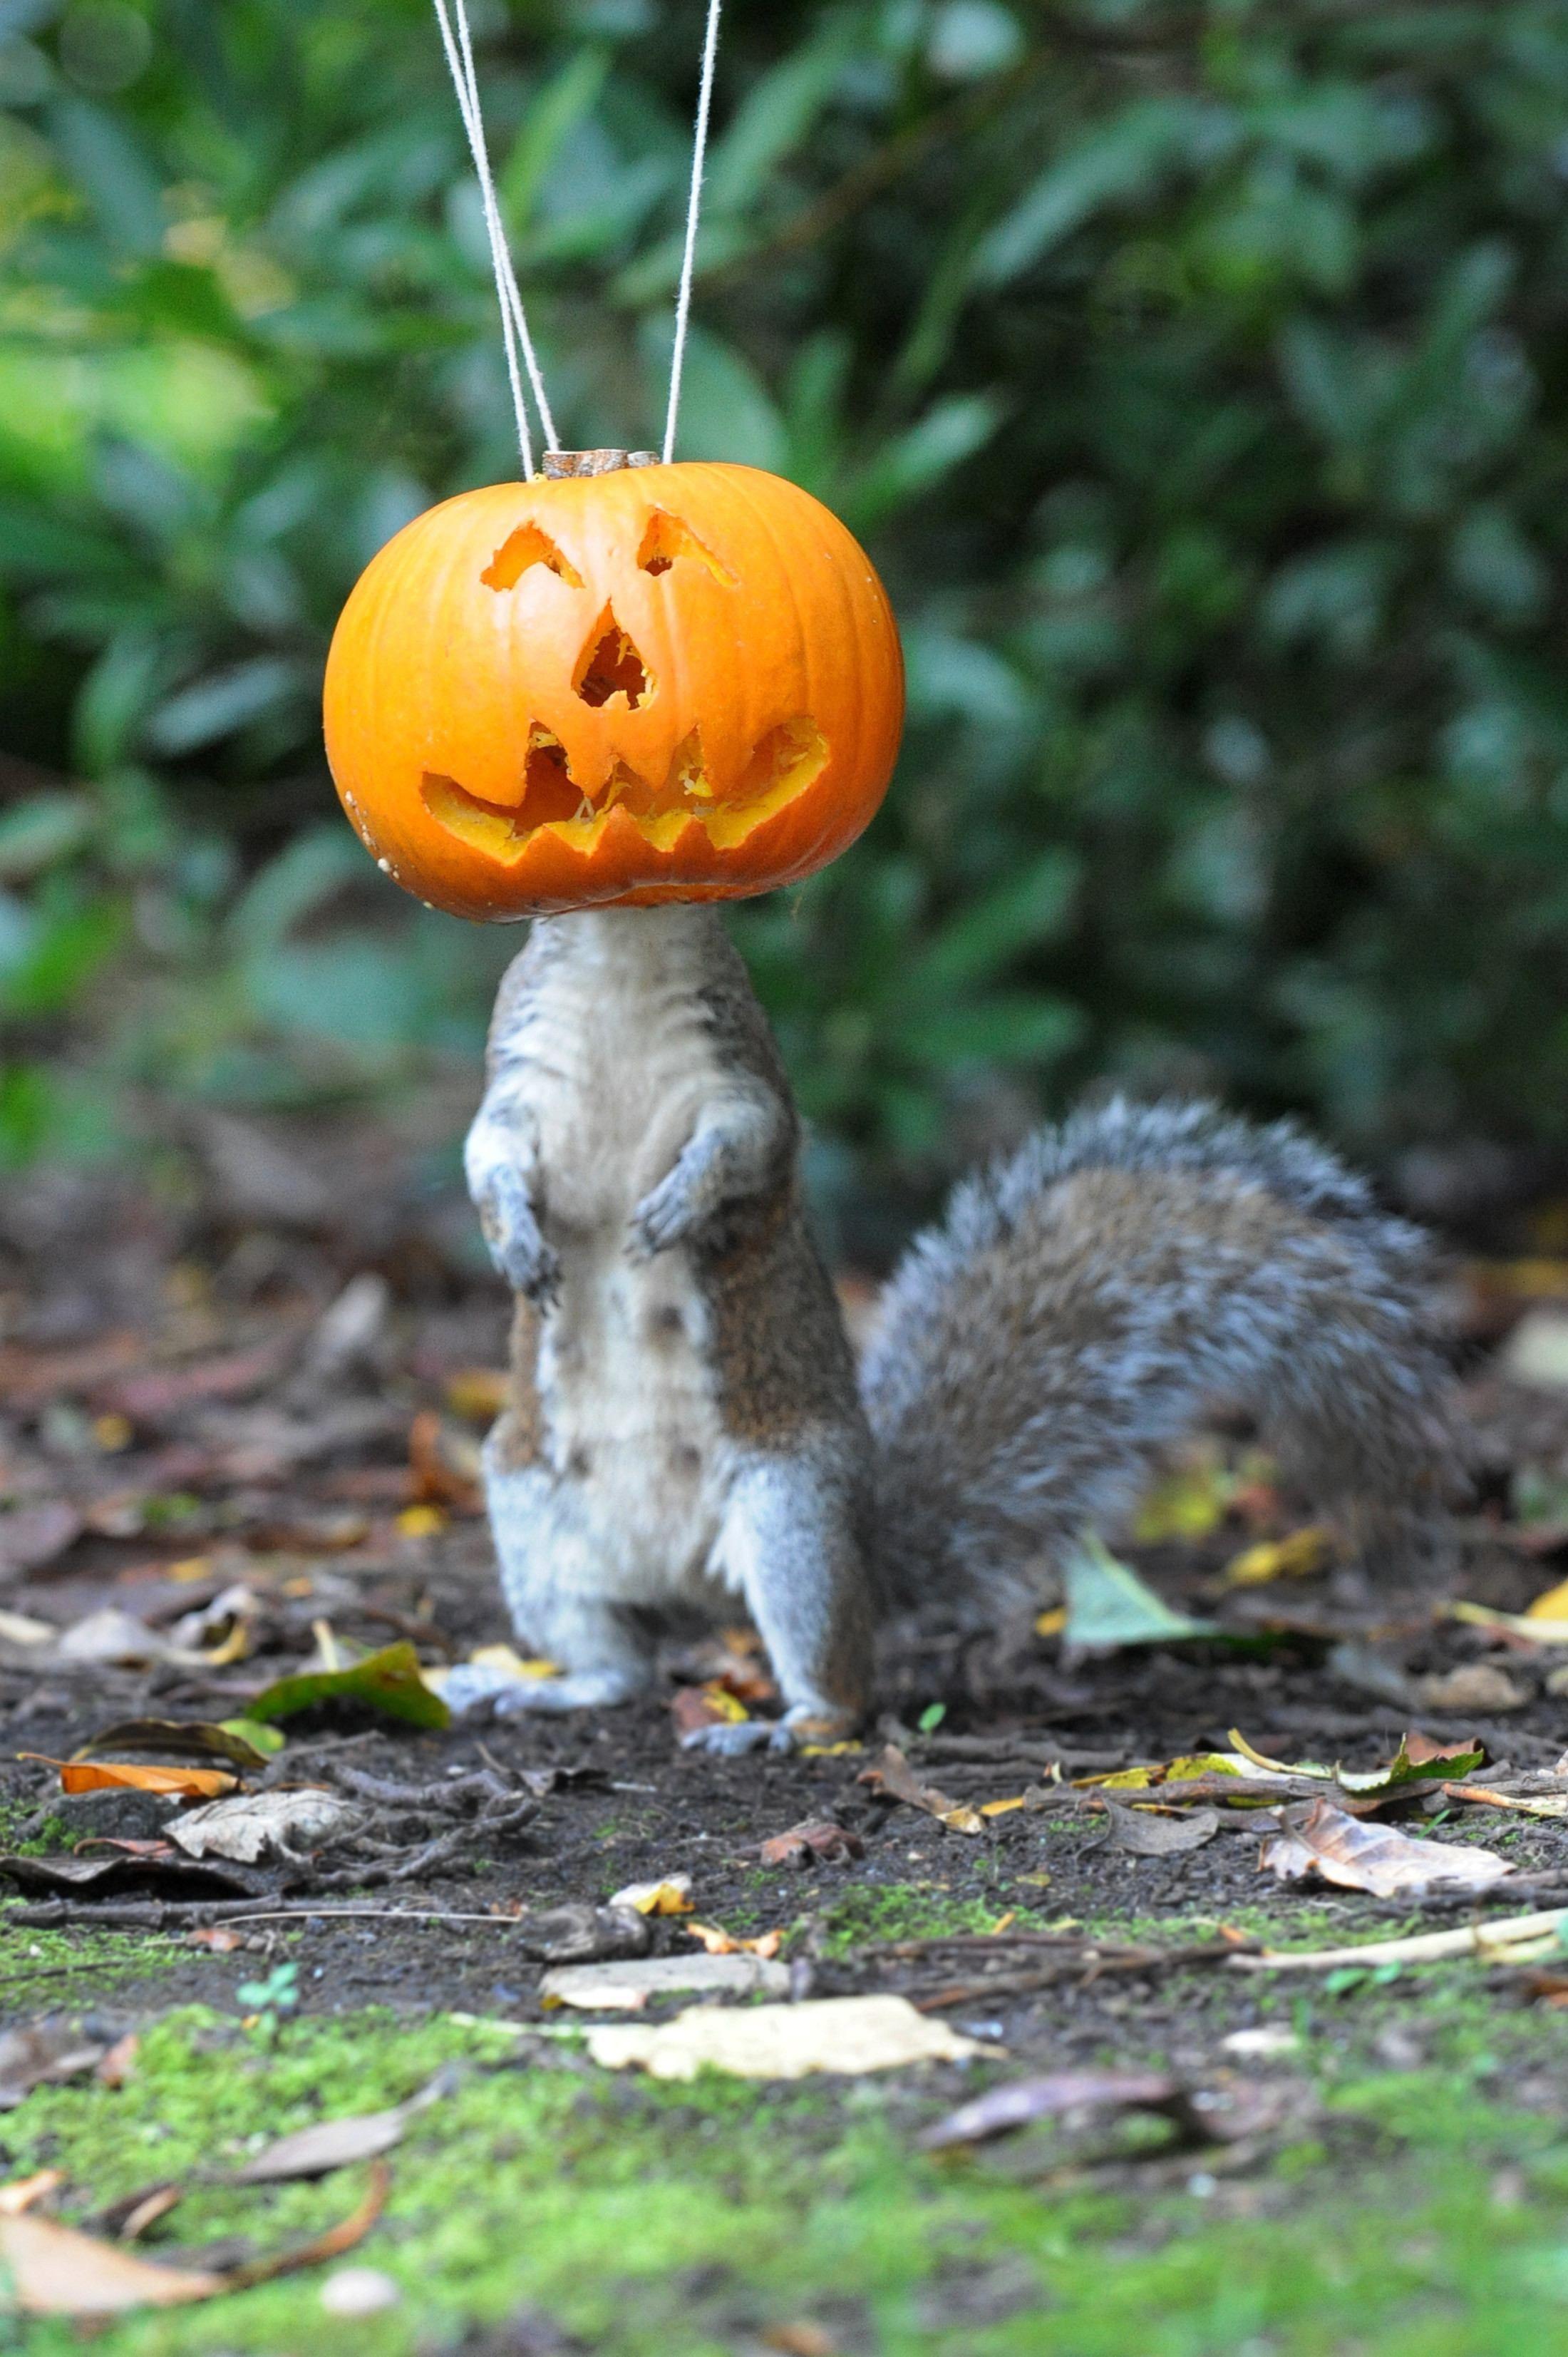 First Zombie Squirrel Then Horse Head Squirrel And Now Ichibod